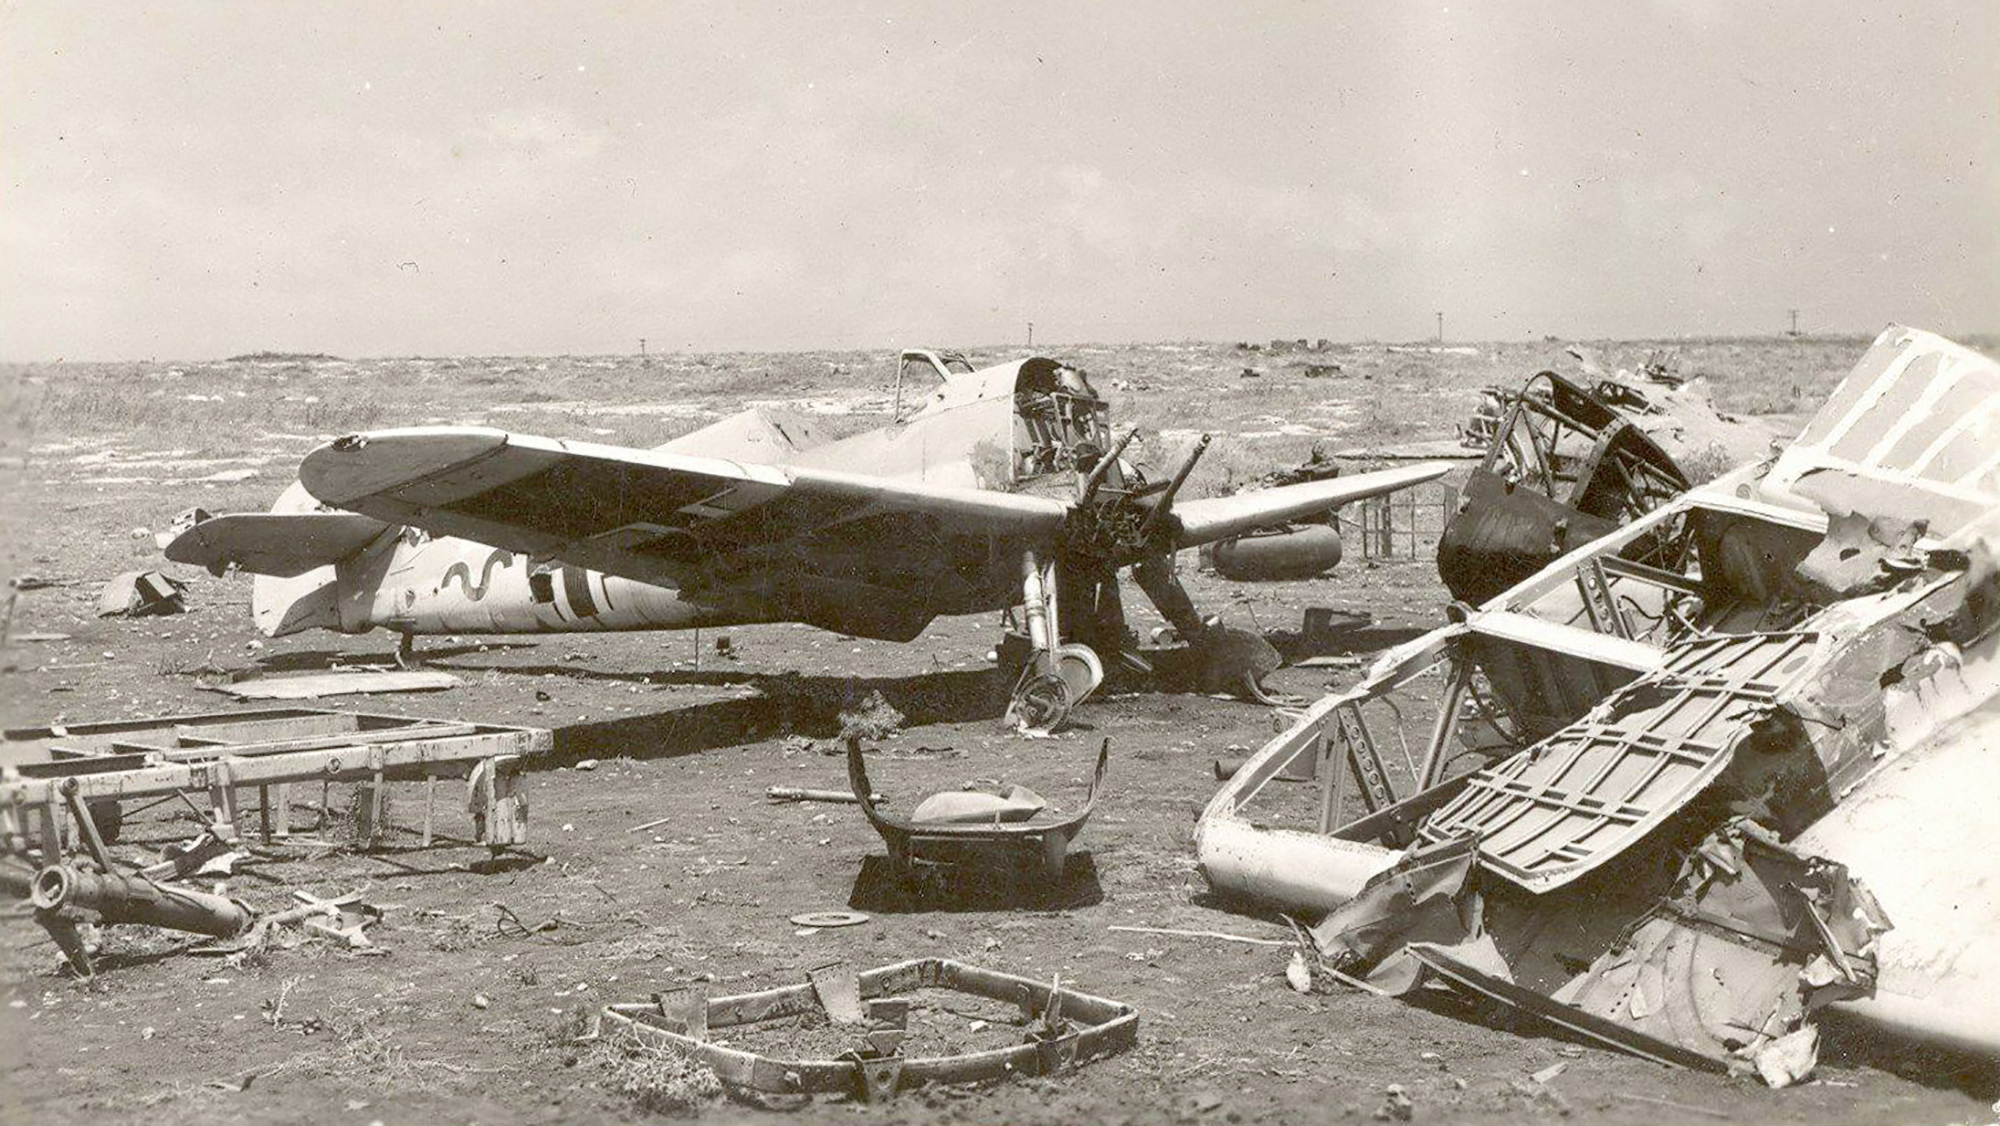 Messerschmitt Bf 109F4Trop 8.JG27 Black 4 abandoned airframe Derna Nov 1942 ebay1